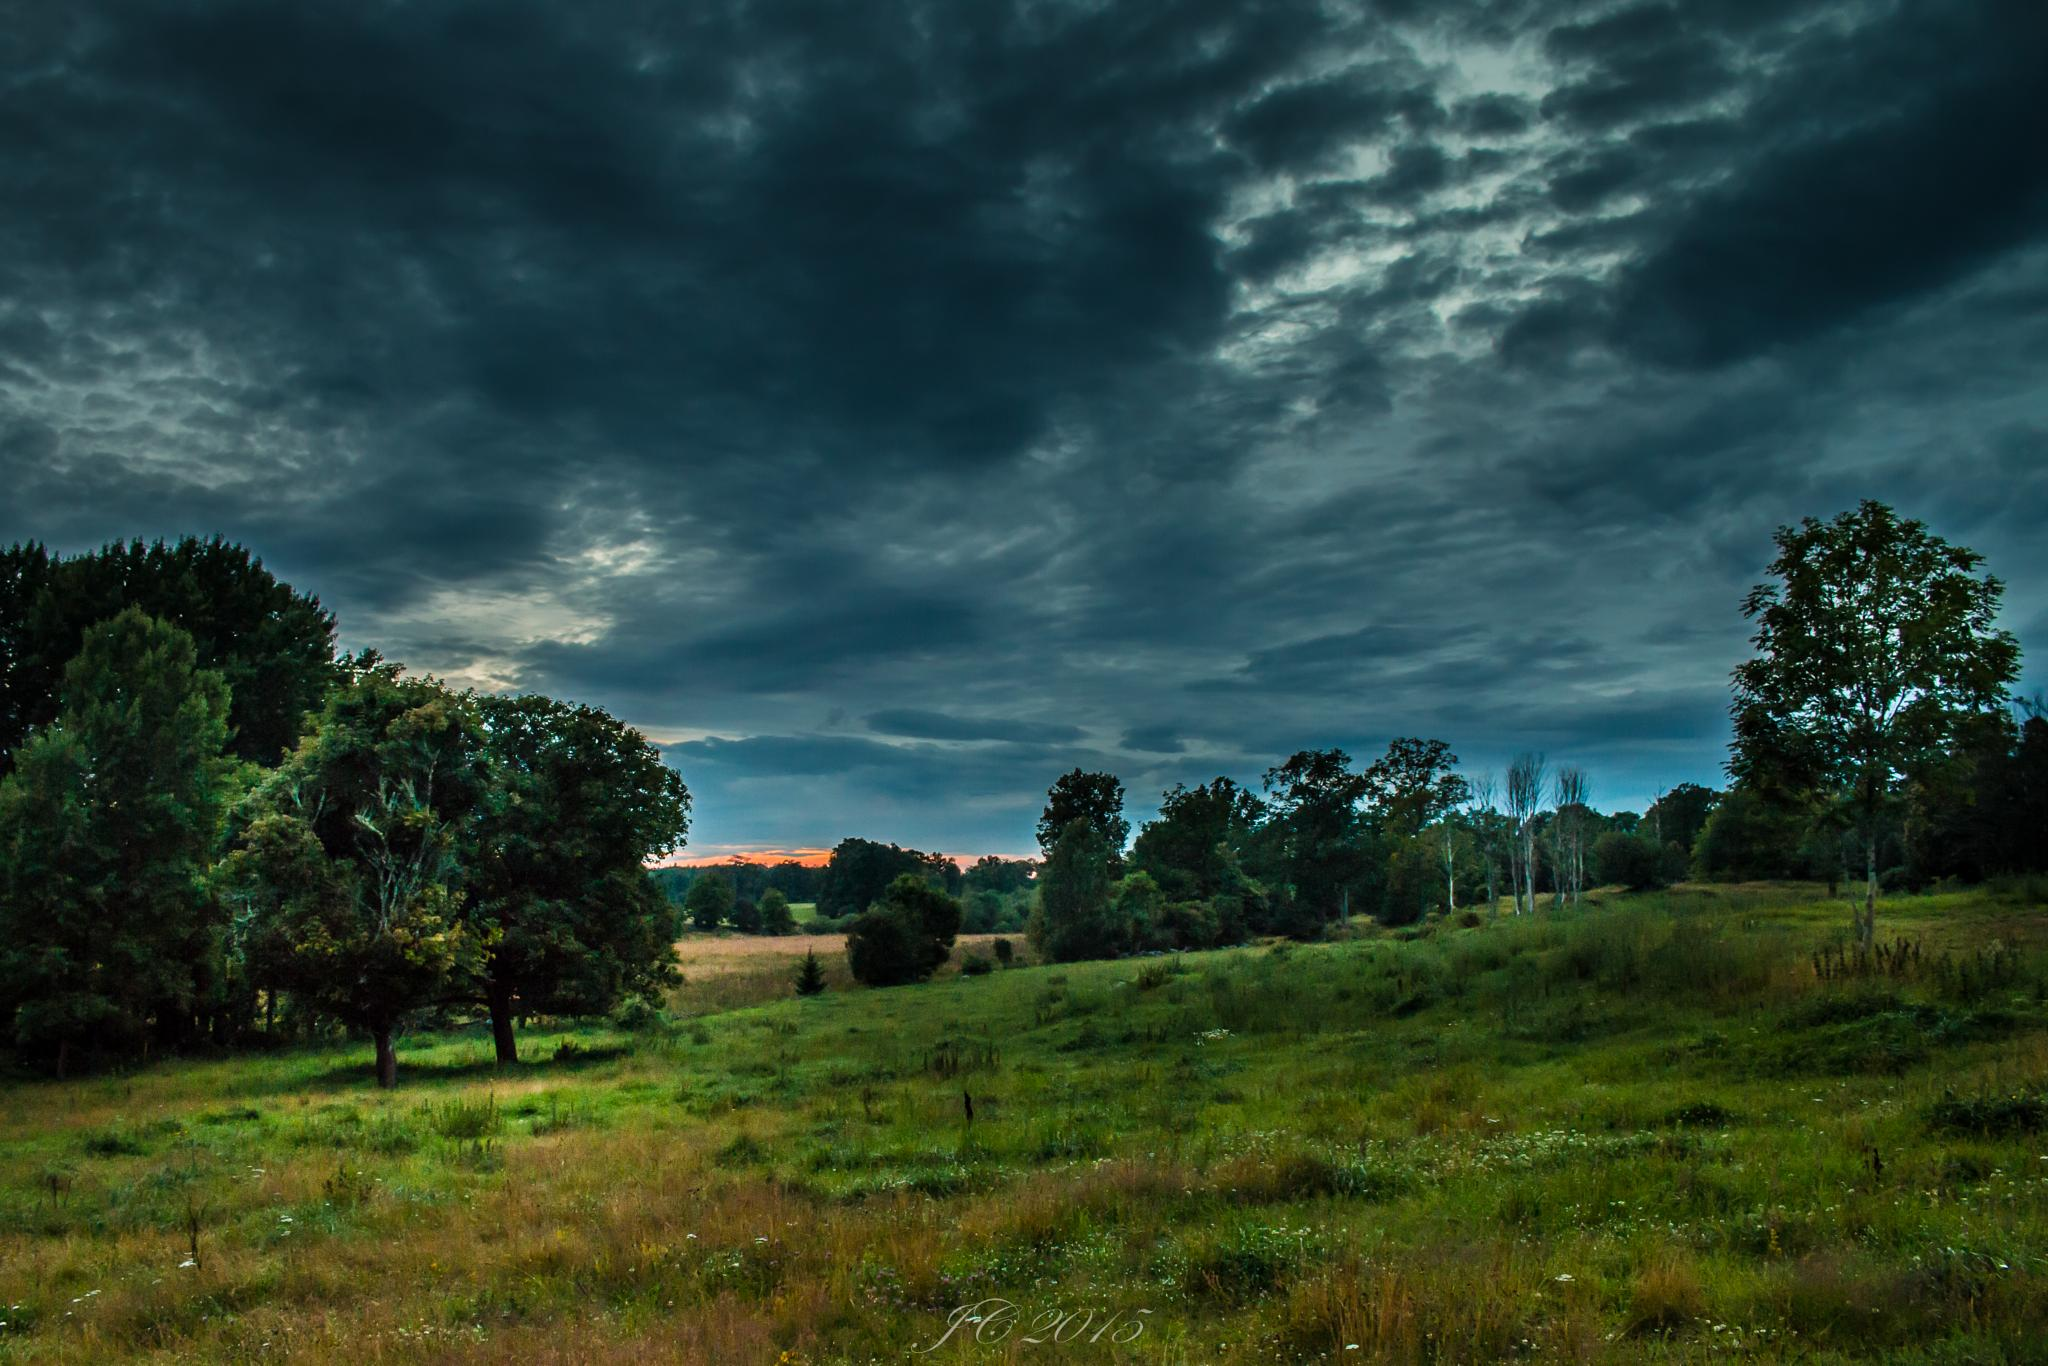 Swedish Summer Night - The Light Fantastic by carljan w carlsson